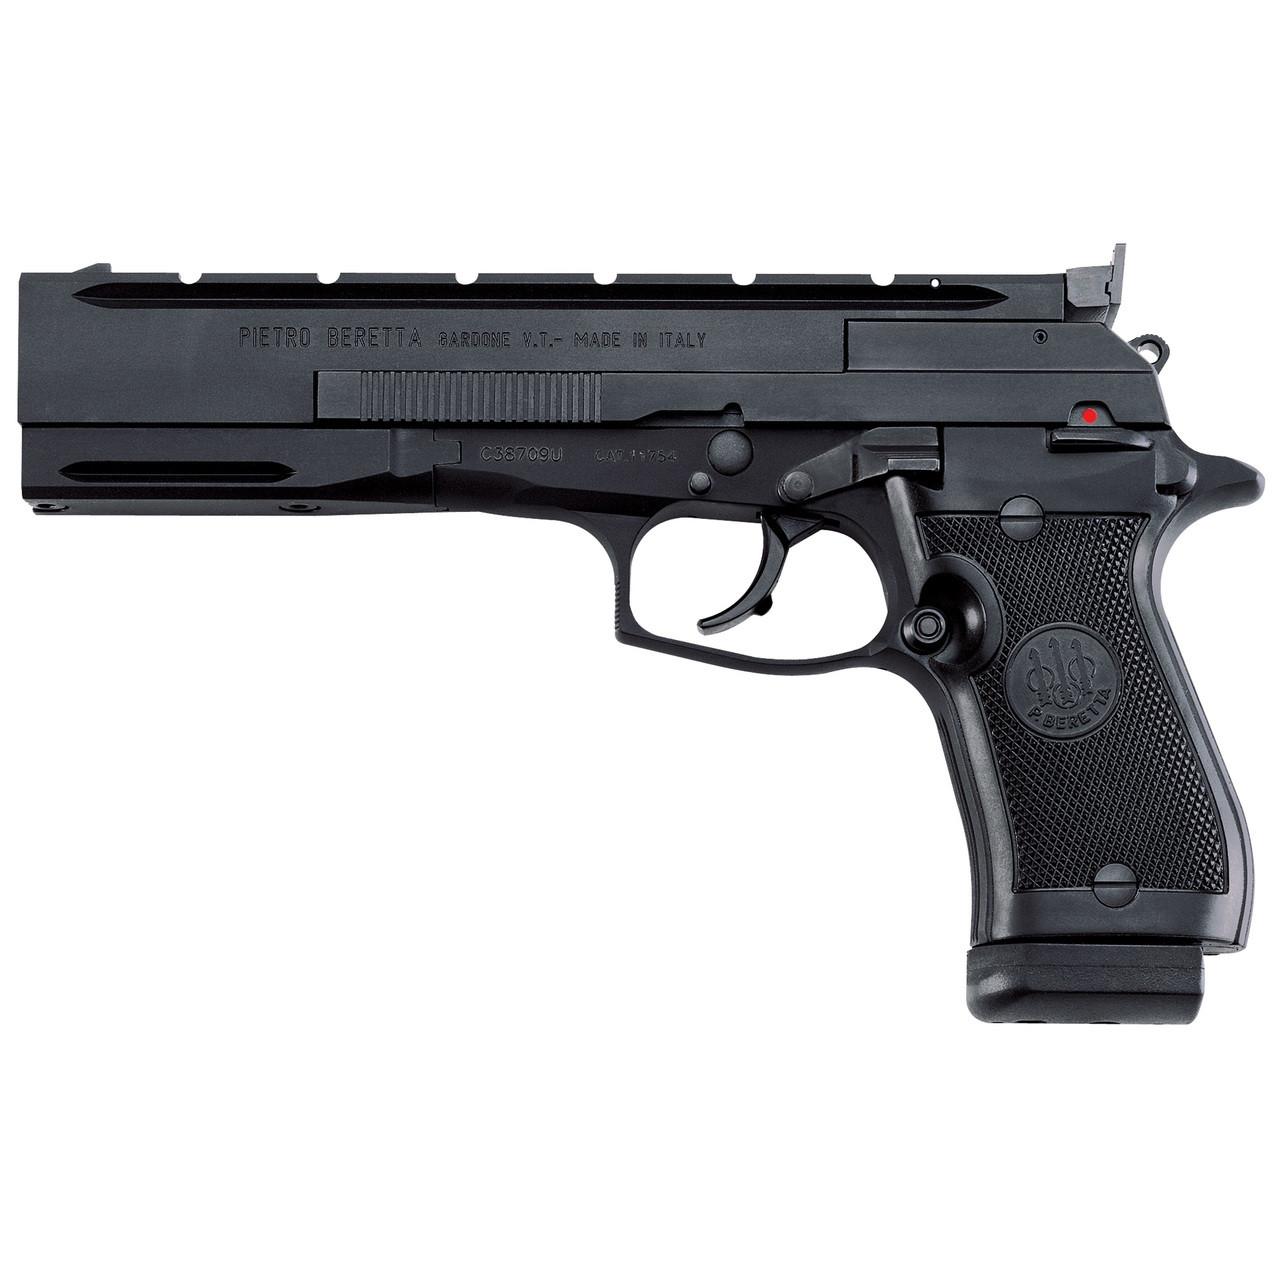 Beretta 87 Target Semi-Automatic, 22LR, 5 9